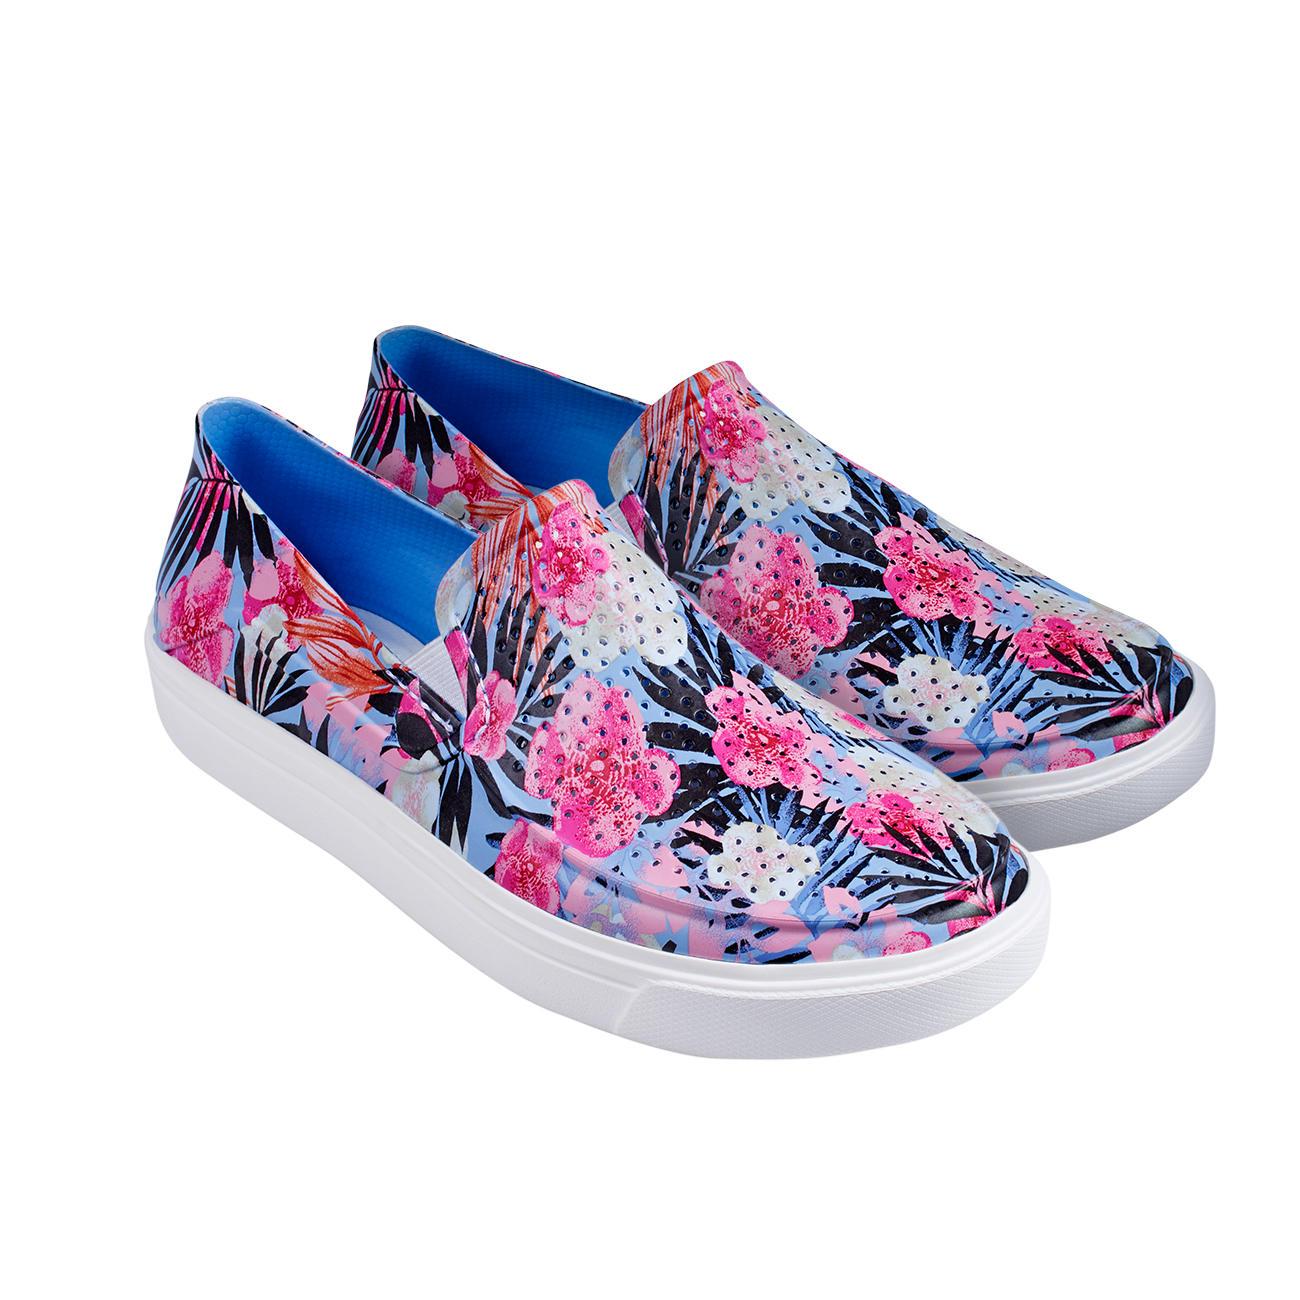 hot sale online e1114 e6f59 Crocs Slip-On, Damen | Mode-Klassiker entdecken